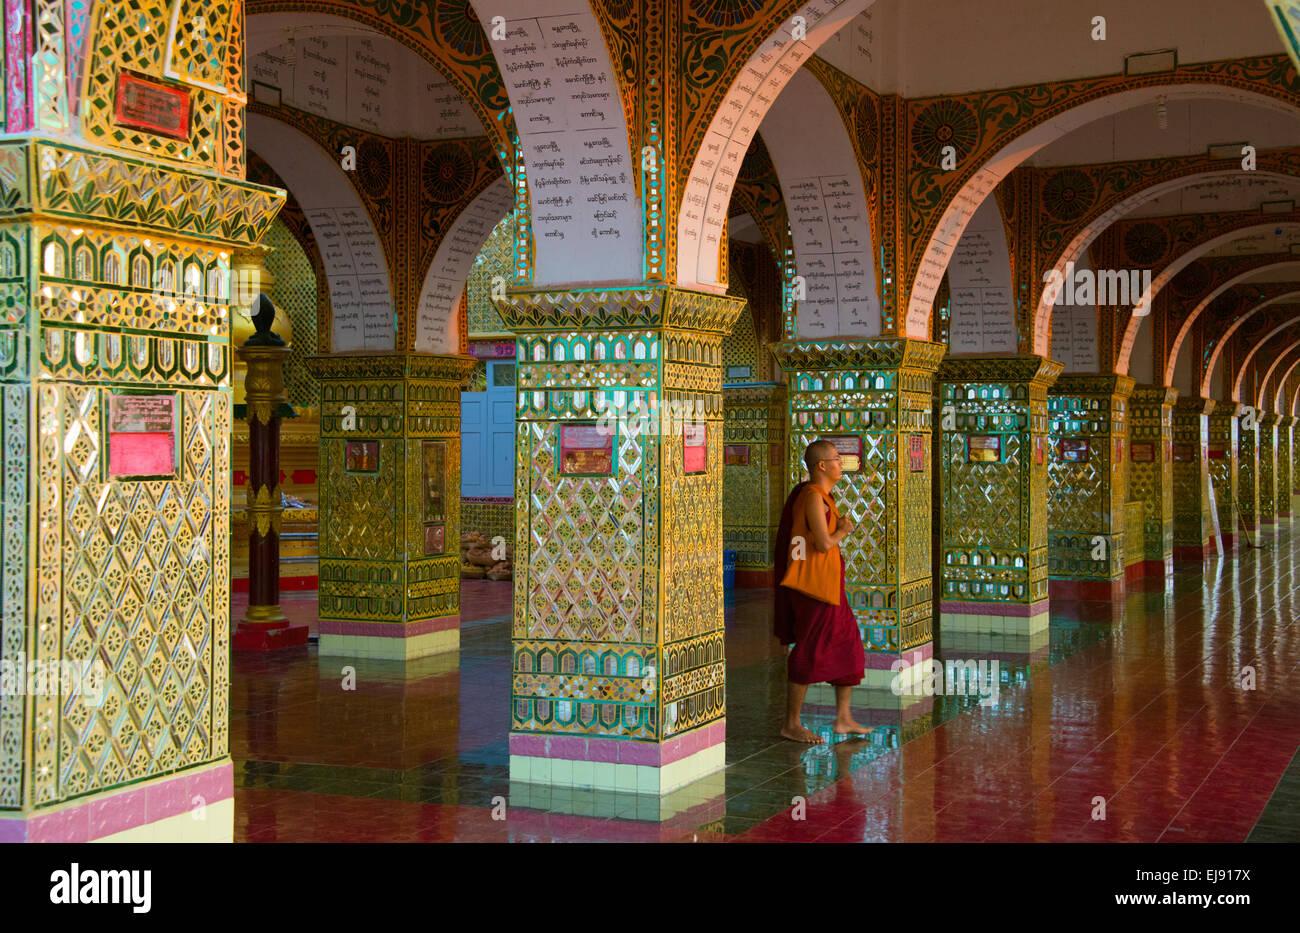 Monk at Su Taung Pyi (Sutaungpyai) on Mandalay Hill, Mandalay, Myanmar Stock Photo